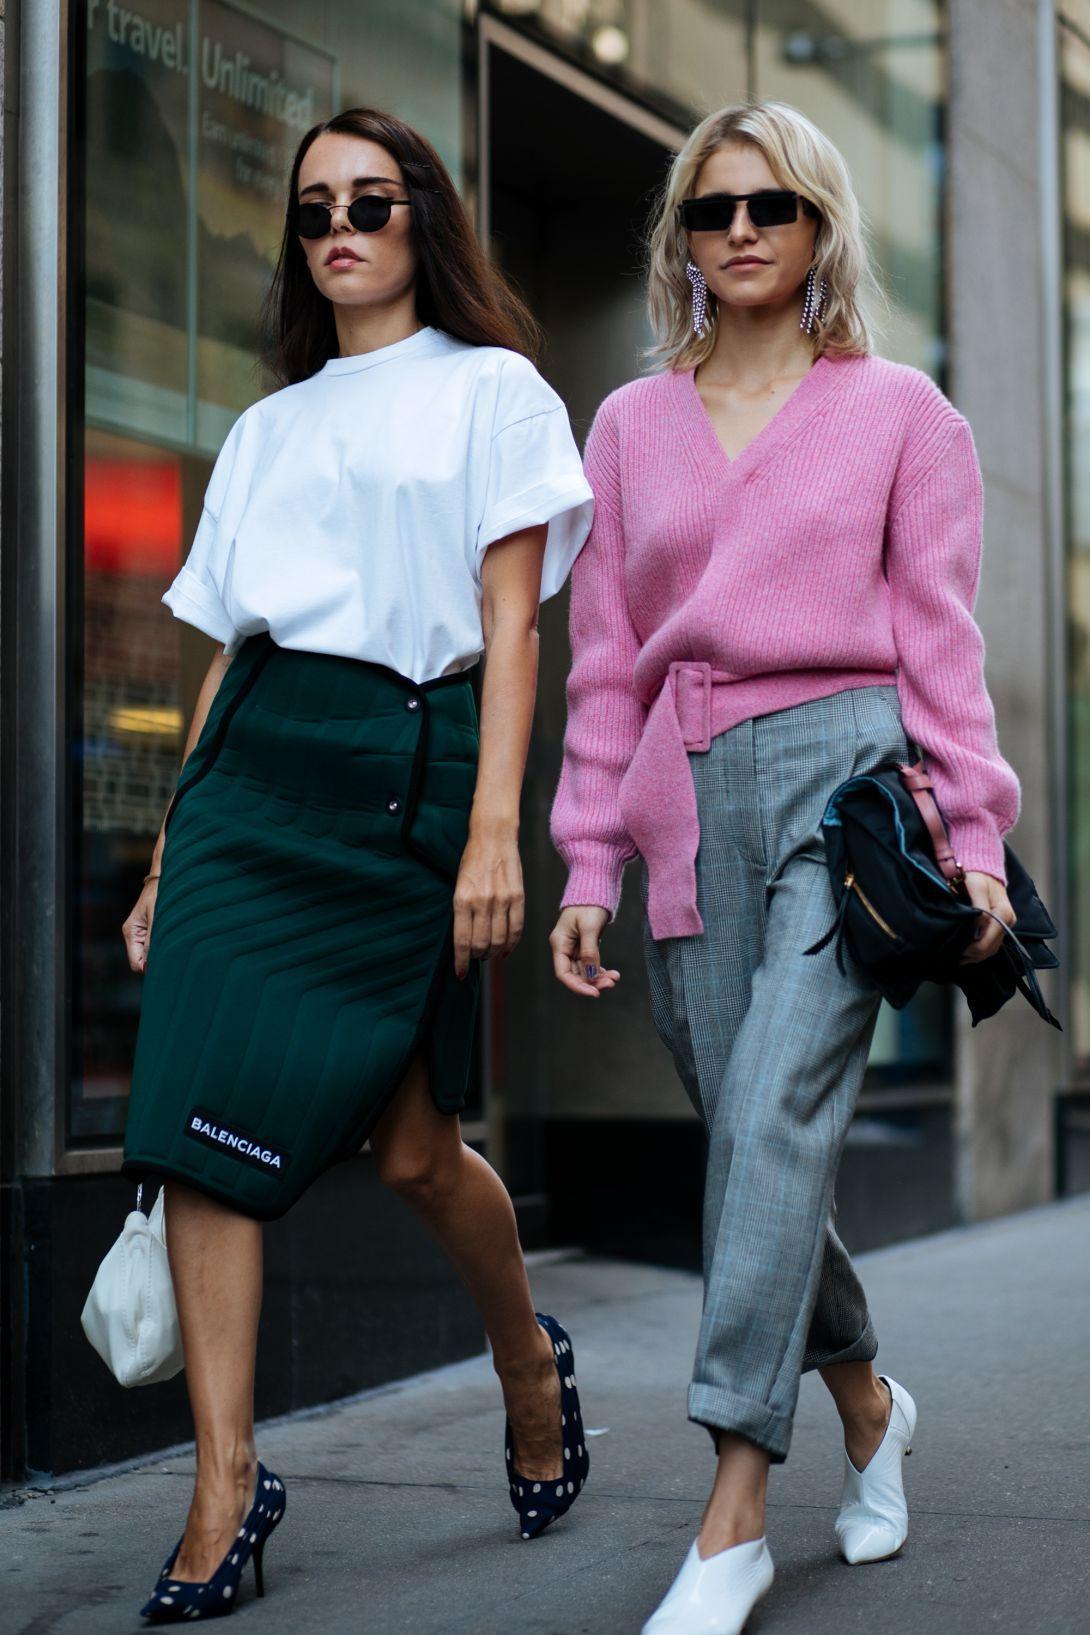 d14b83c5 It's Baaaaack: All The New York Fashion Week Street Style You Need ...